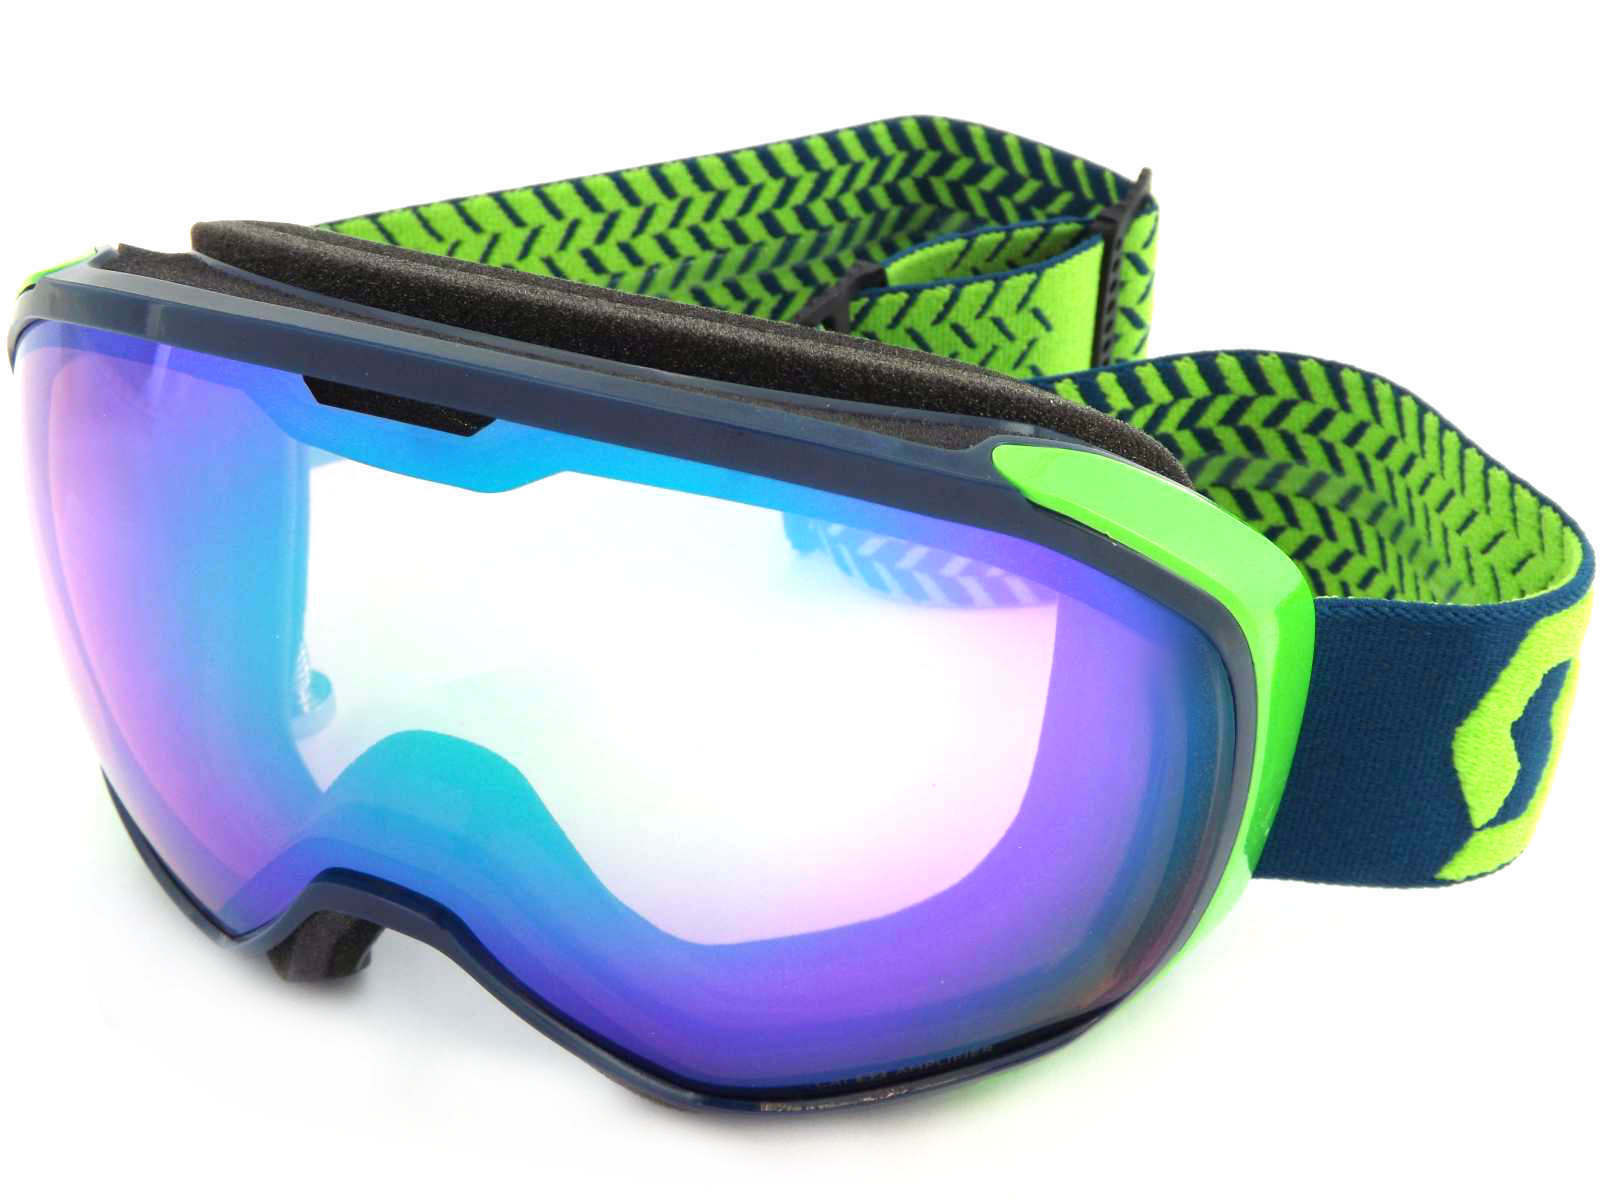 SCOTT - FIX bluee Green    Amplifier green Chrome Mirror Snow Ski Goggles 260568  100% genuine counter guarantee